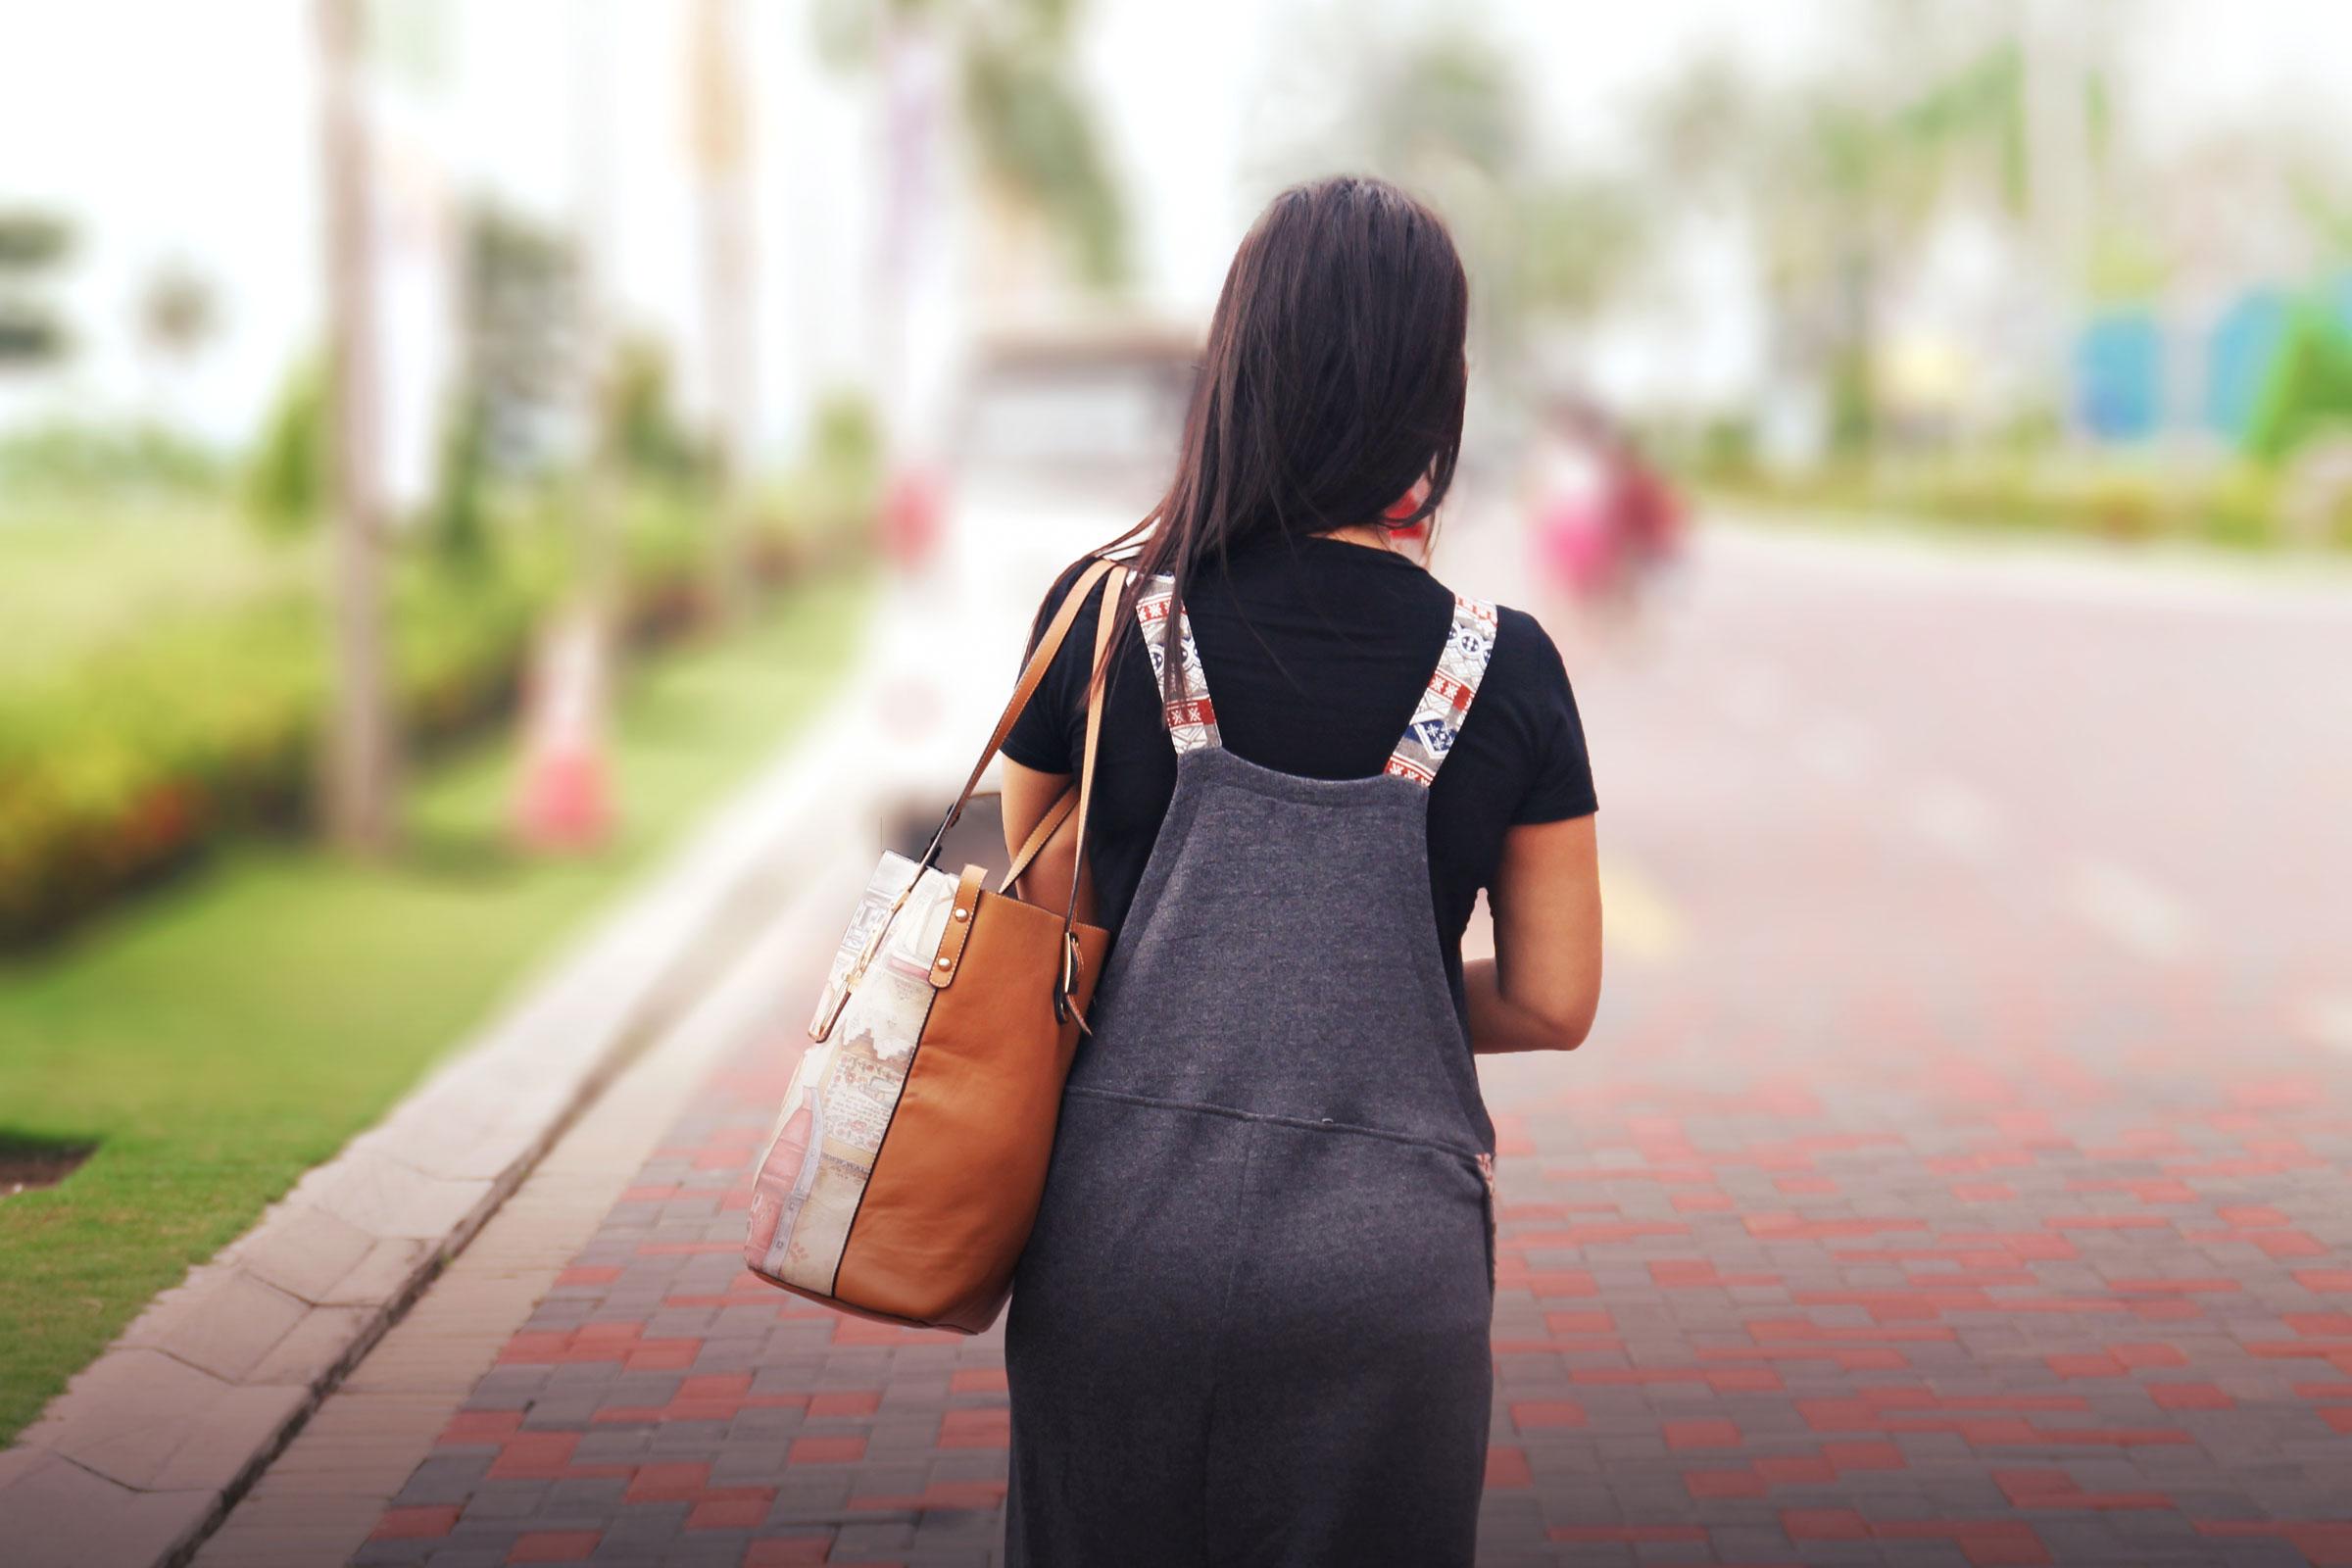 stockvault-woman-walking-away218845